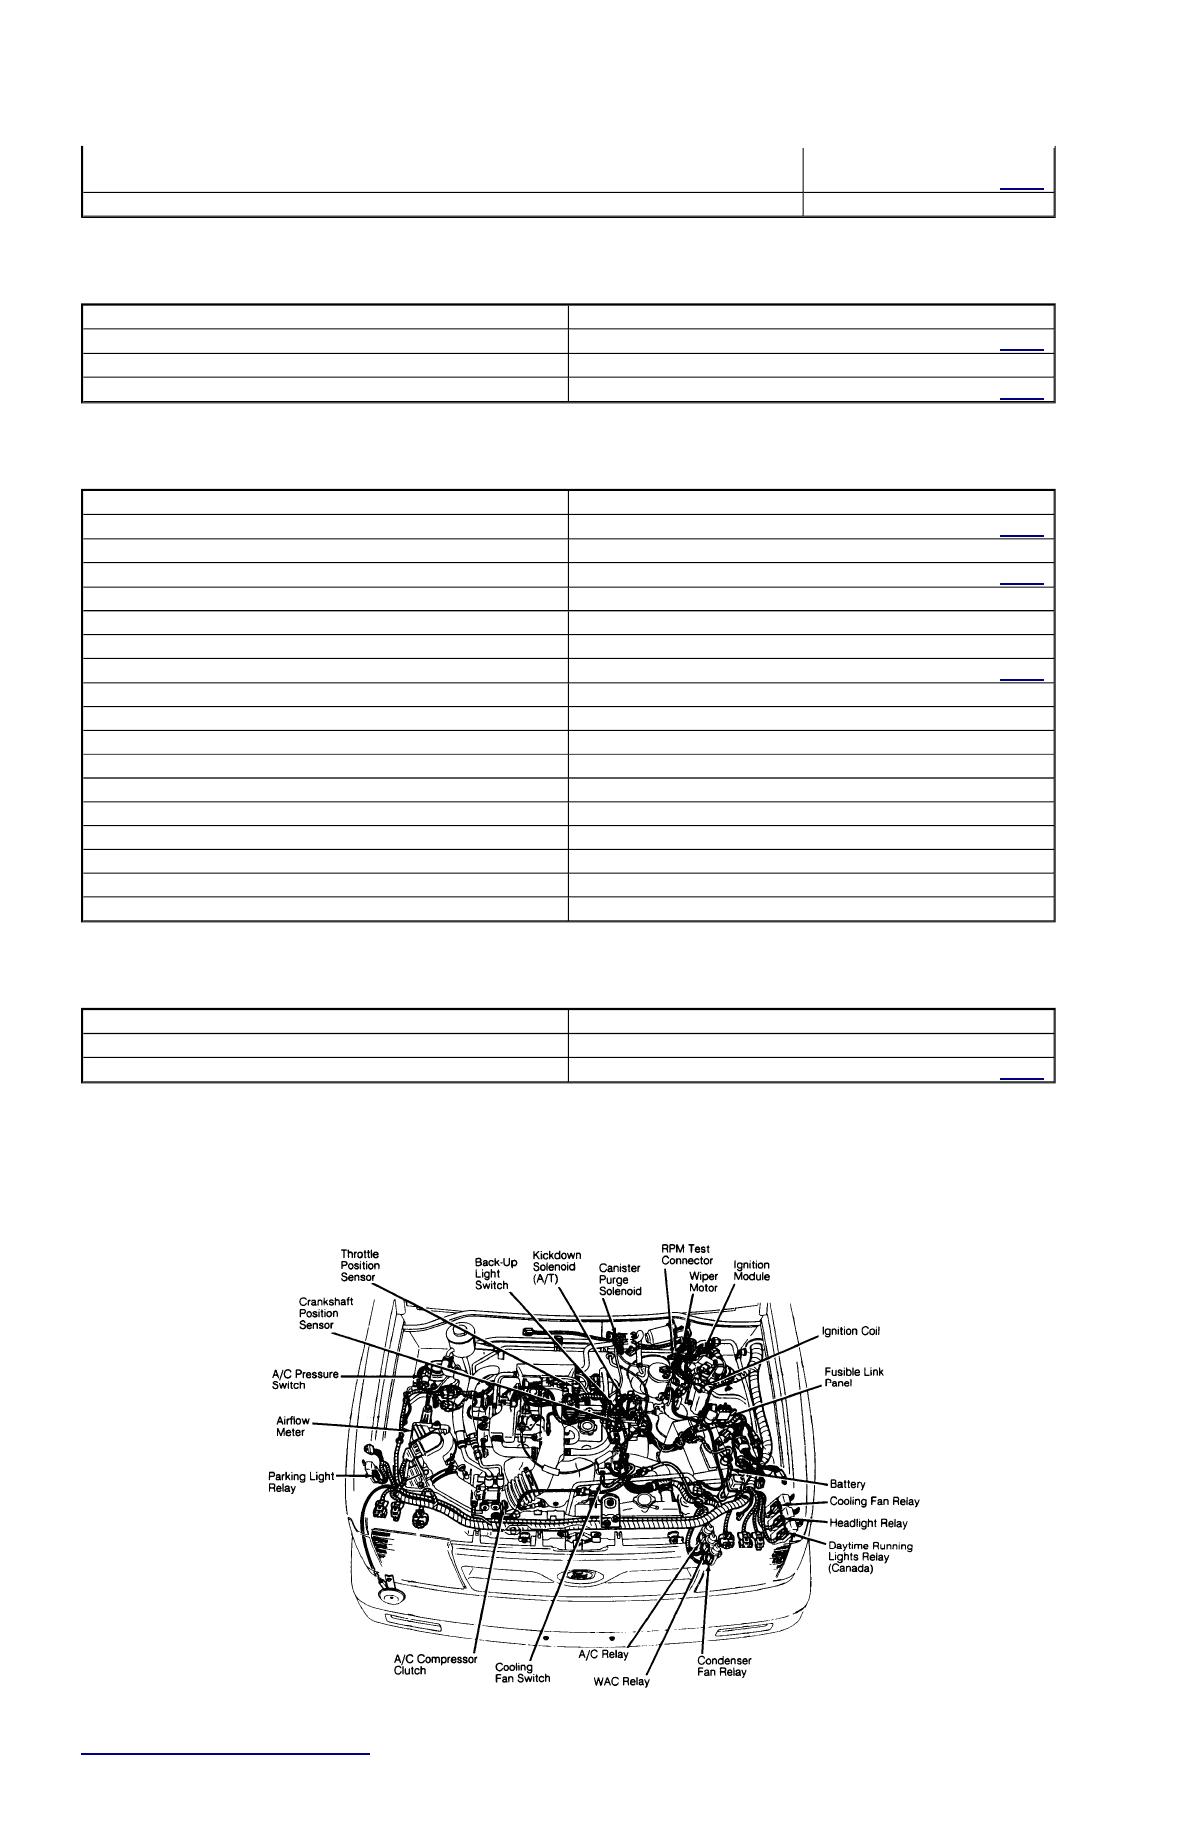 Ford Festiva Instruction Part 12 Wiring Diagram For 1988 Solenoids Solenoid Valves